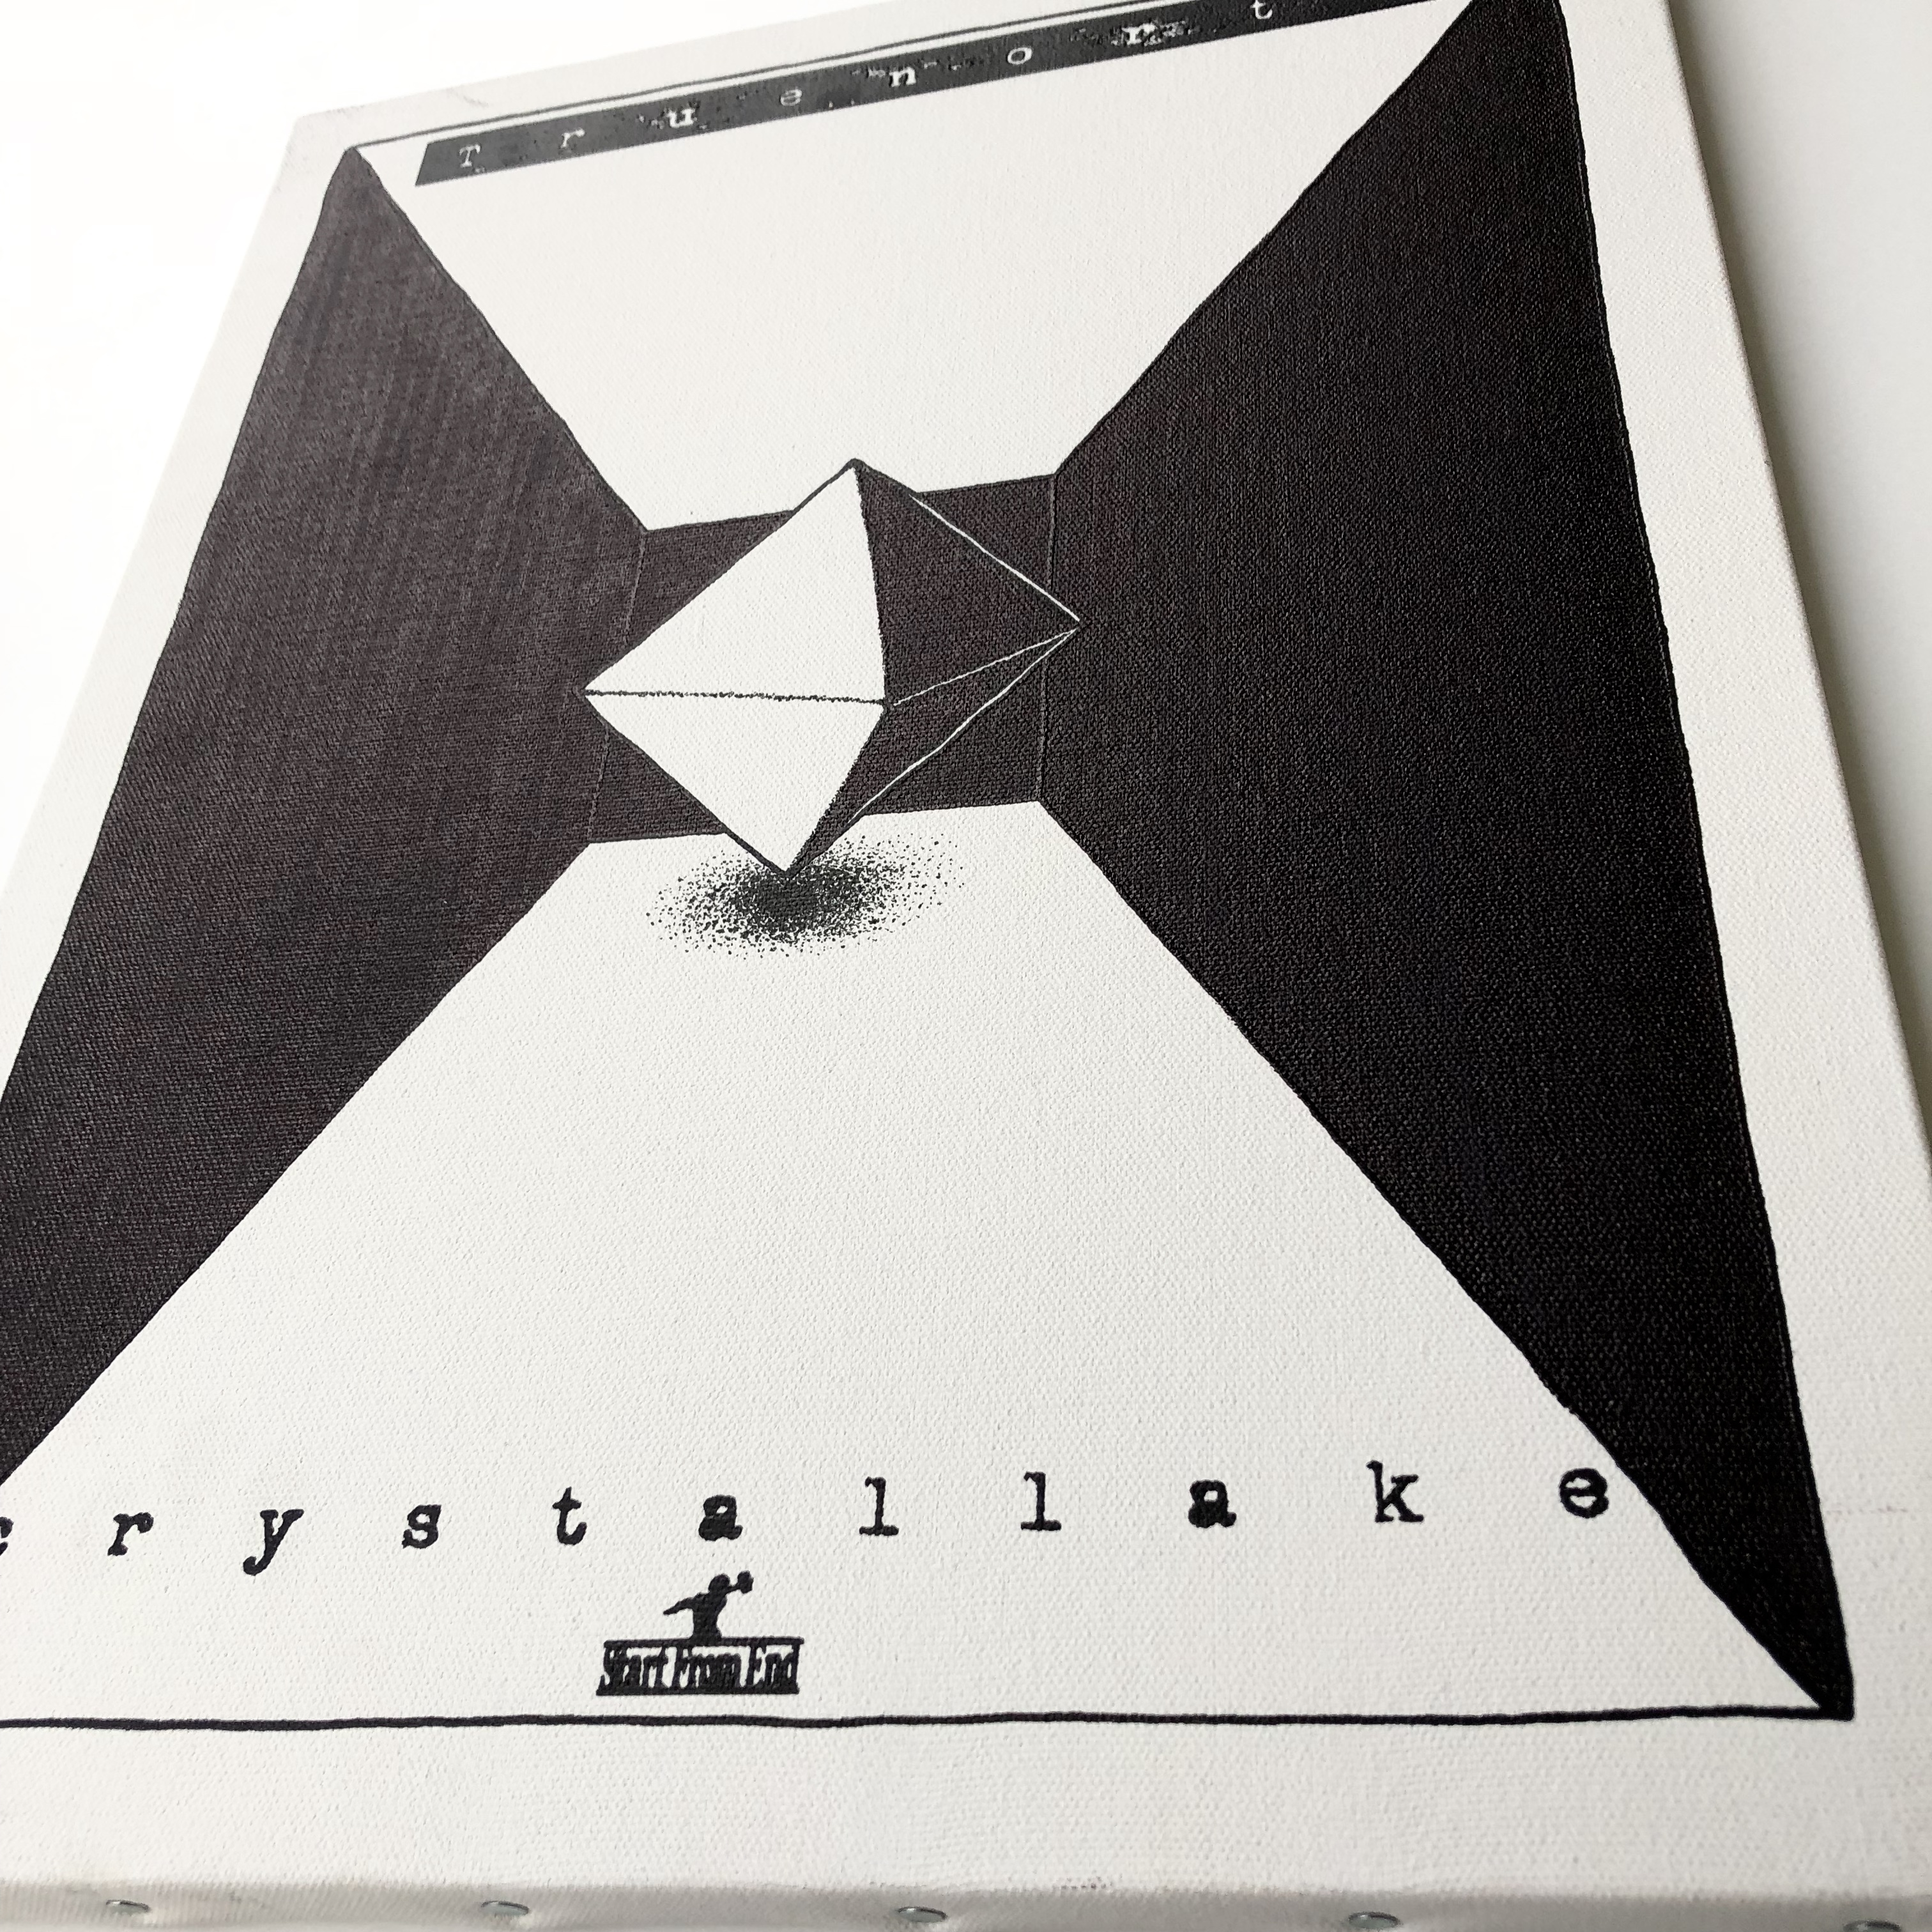 Crystal lake x Start from end B type